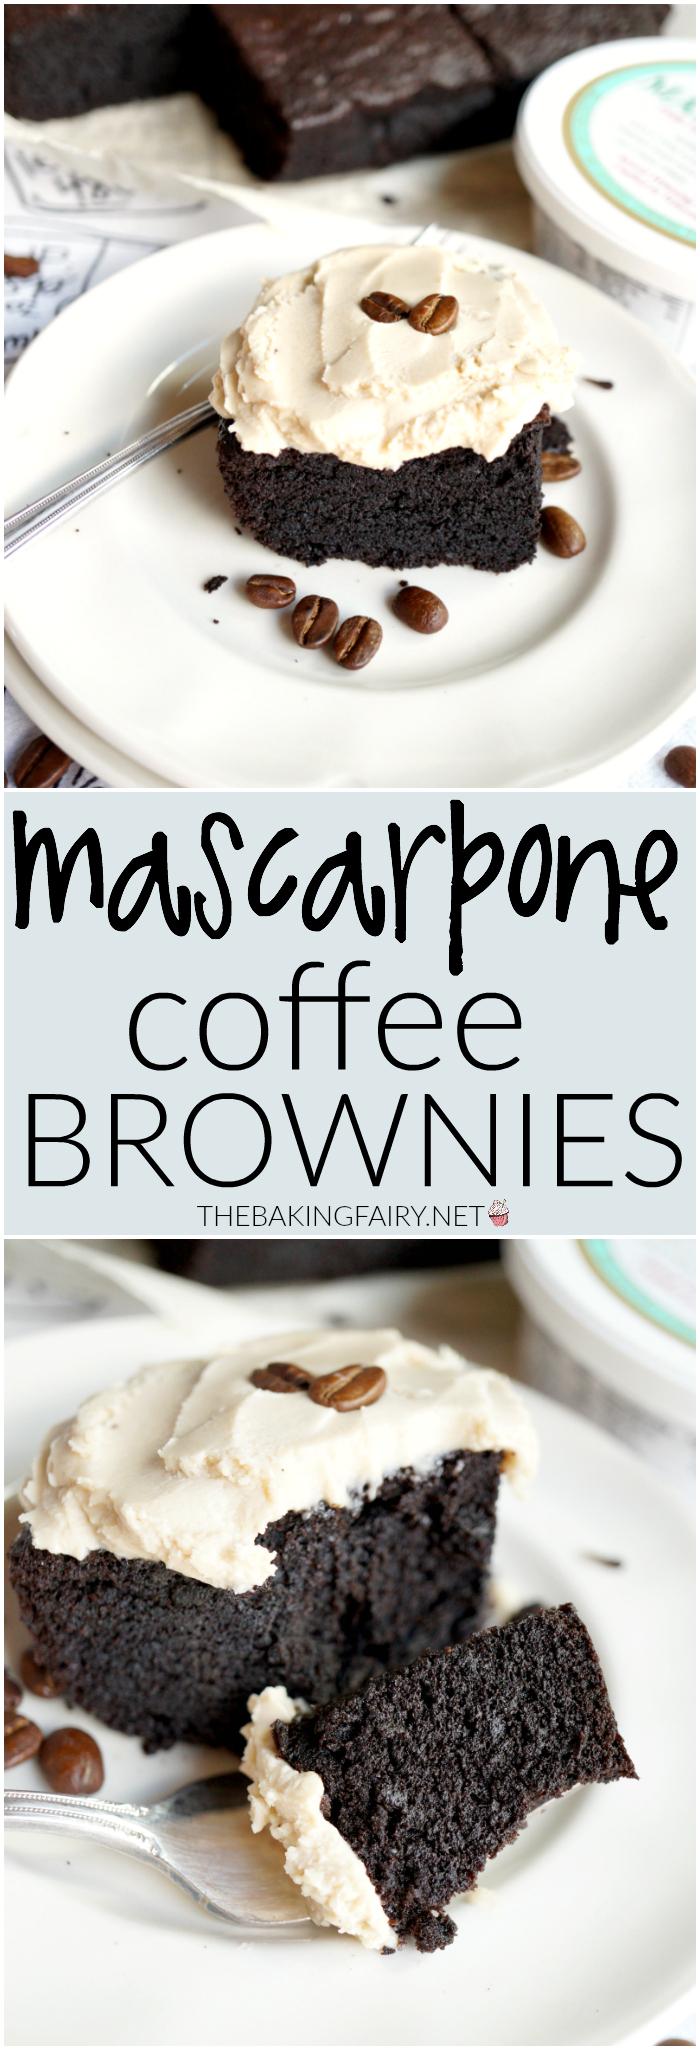 mascarpone coffee brownies | The Baking Fairy